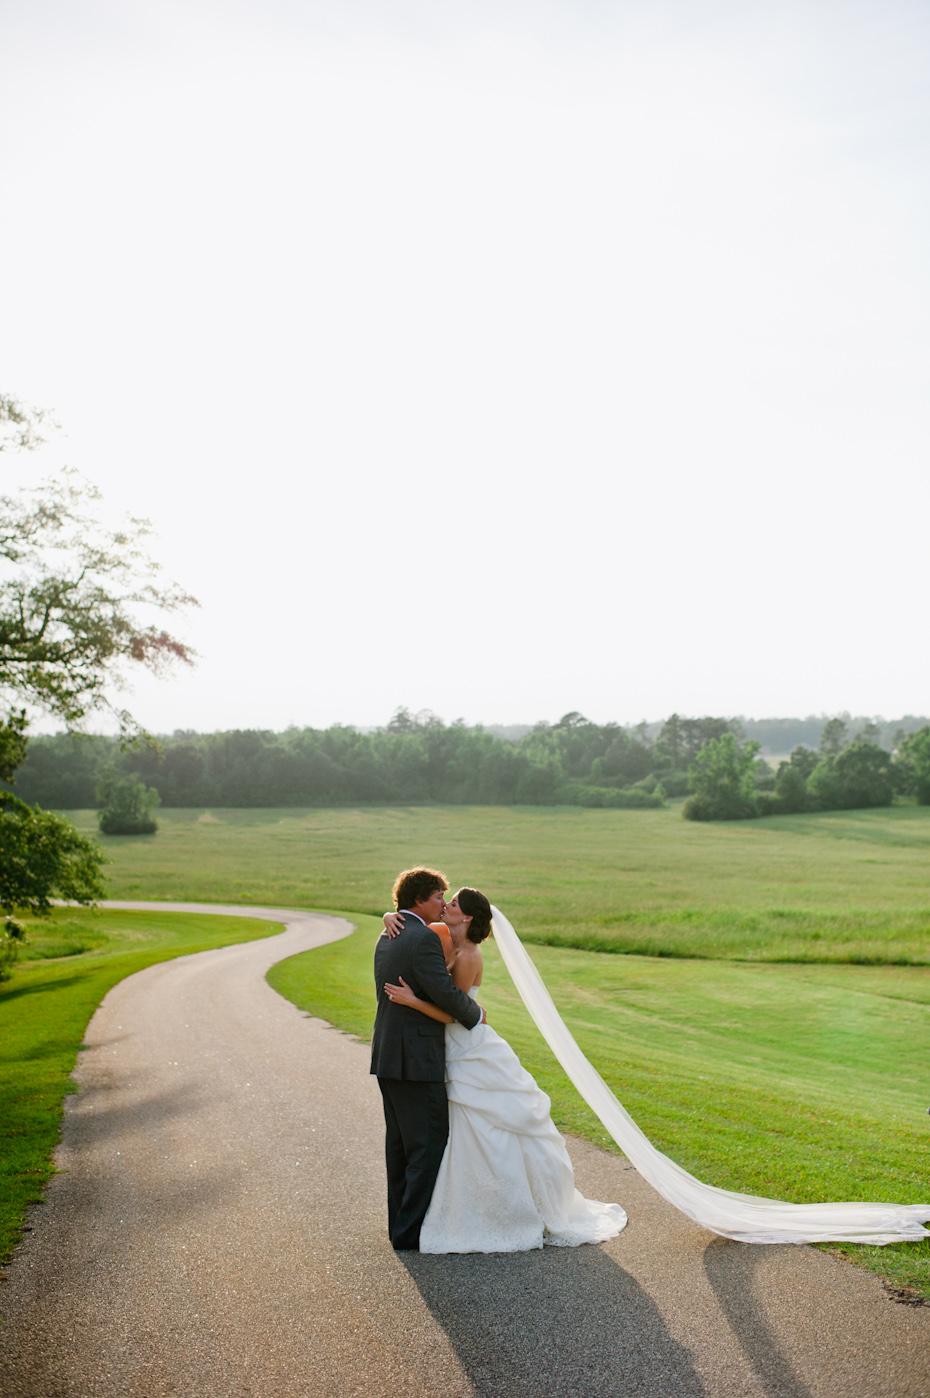 Jason Dufner Wedding